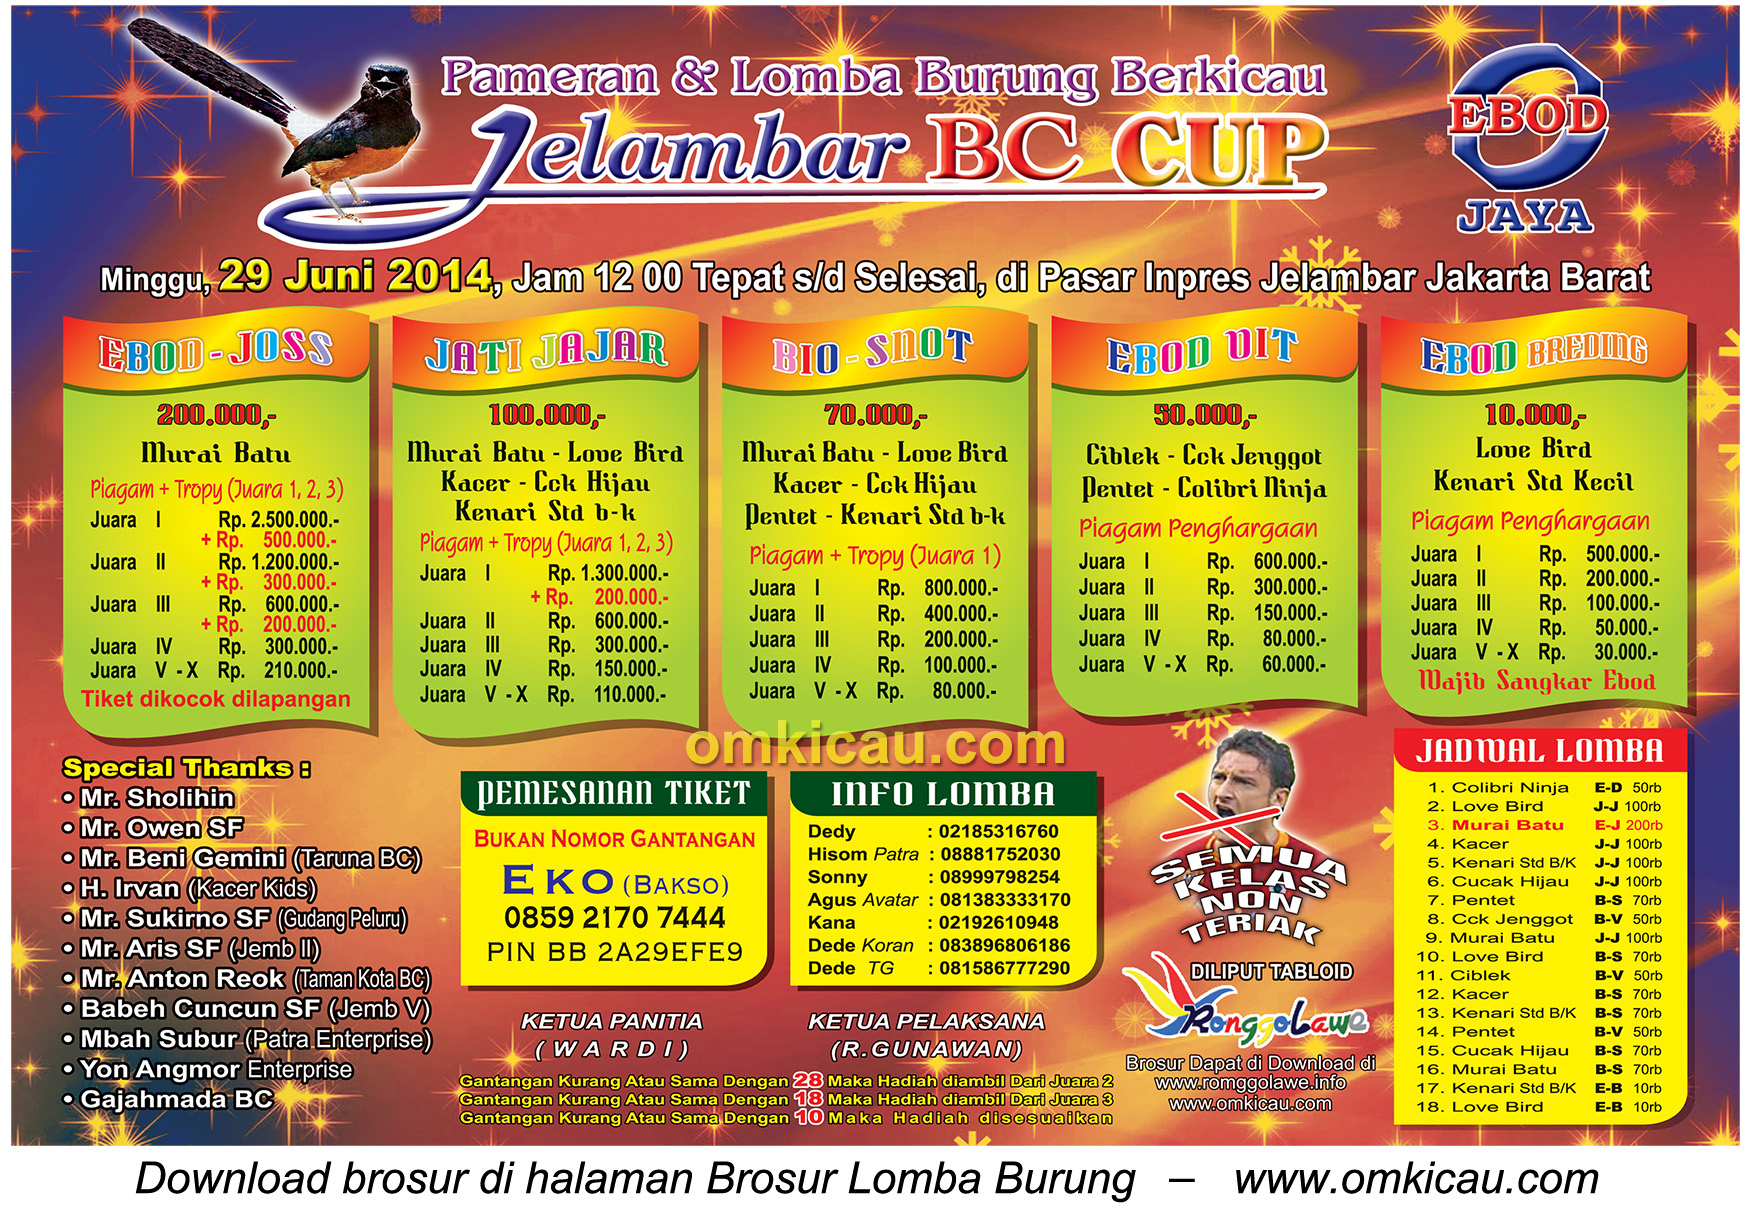 Brosur Lomba Burung Berkicau Jelambar BC Jakarta Barat 29 Juni 2014